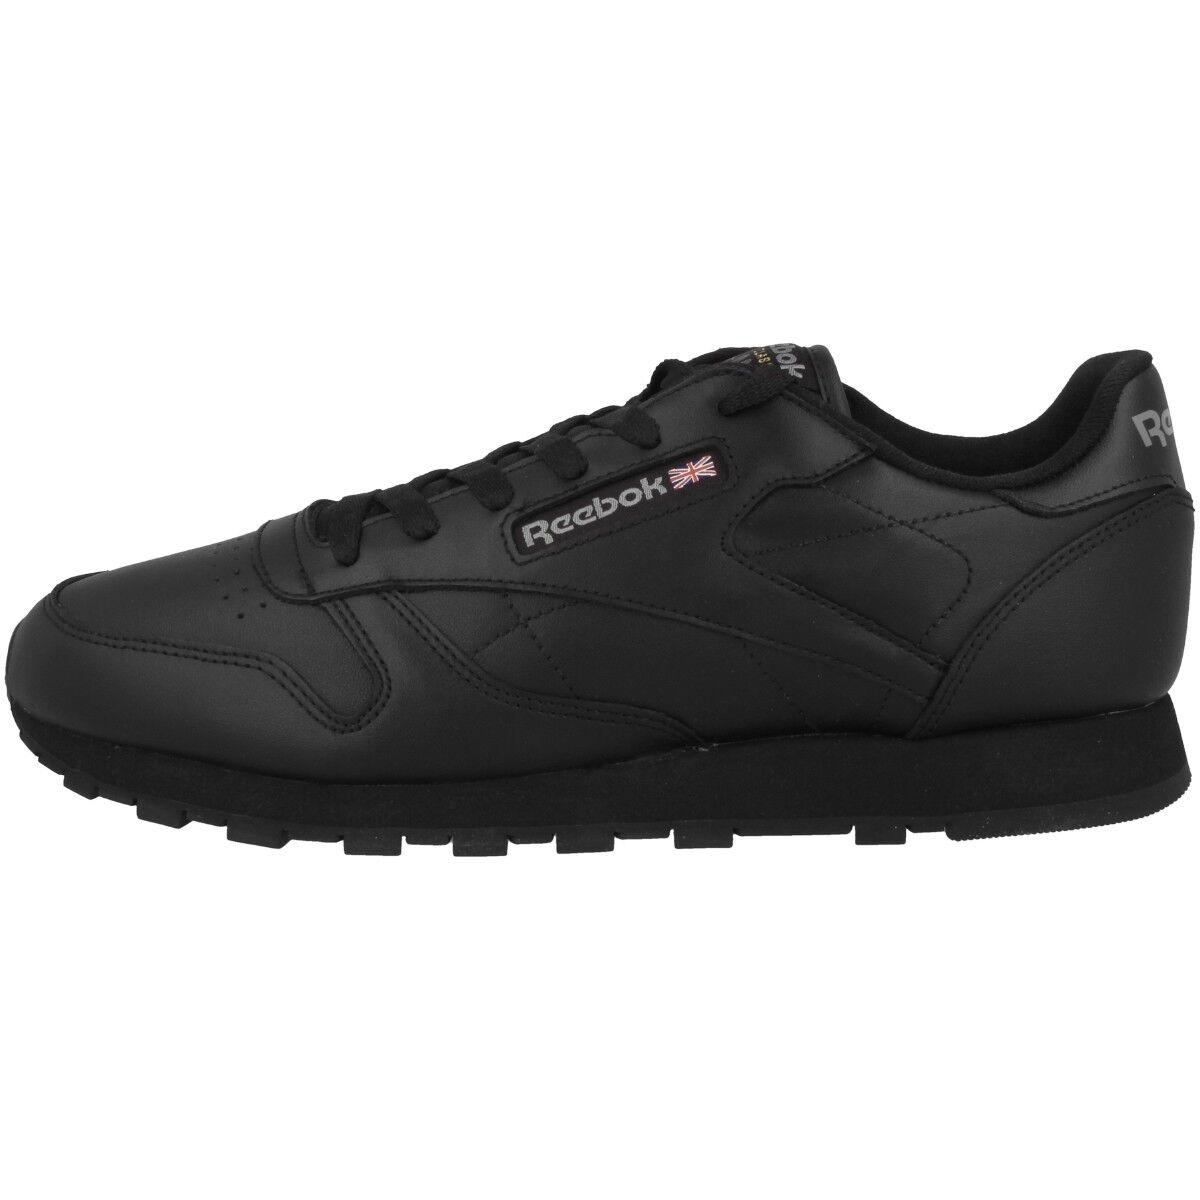 premium selection 07ac5 d263f Nike Free 5.0 entrenador fit Print zapatos fitness Sport turn run 704695  014,Modelo para mujer Philippe lentejuelas de oro Zapatillas Zapatos,